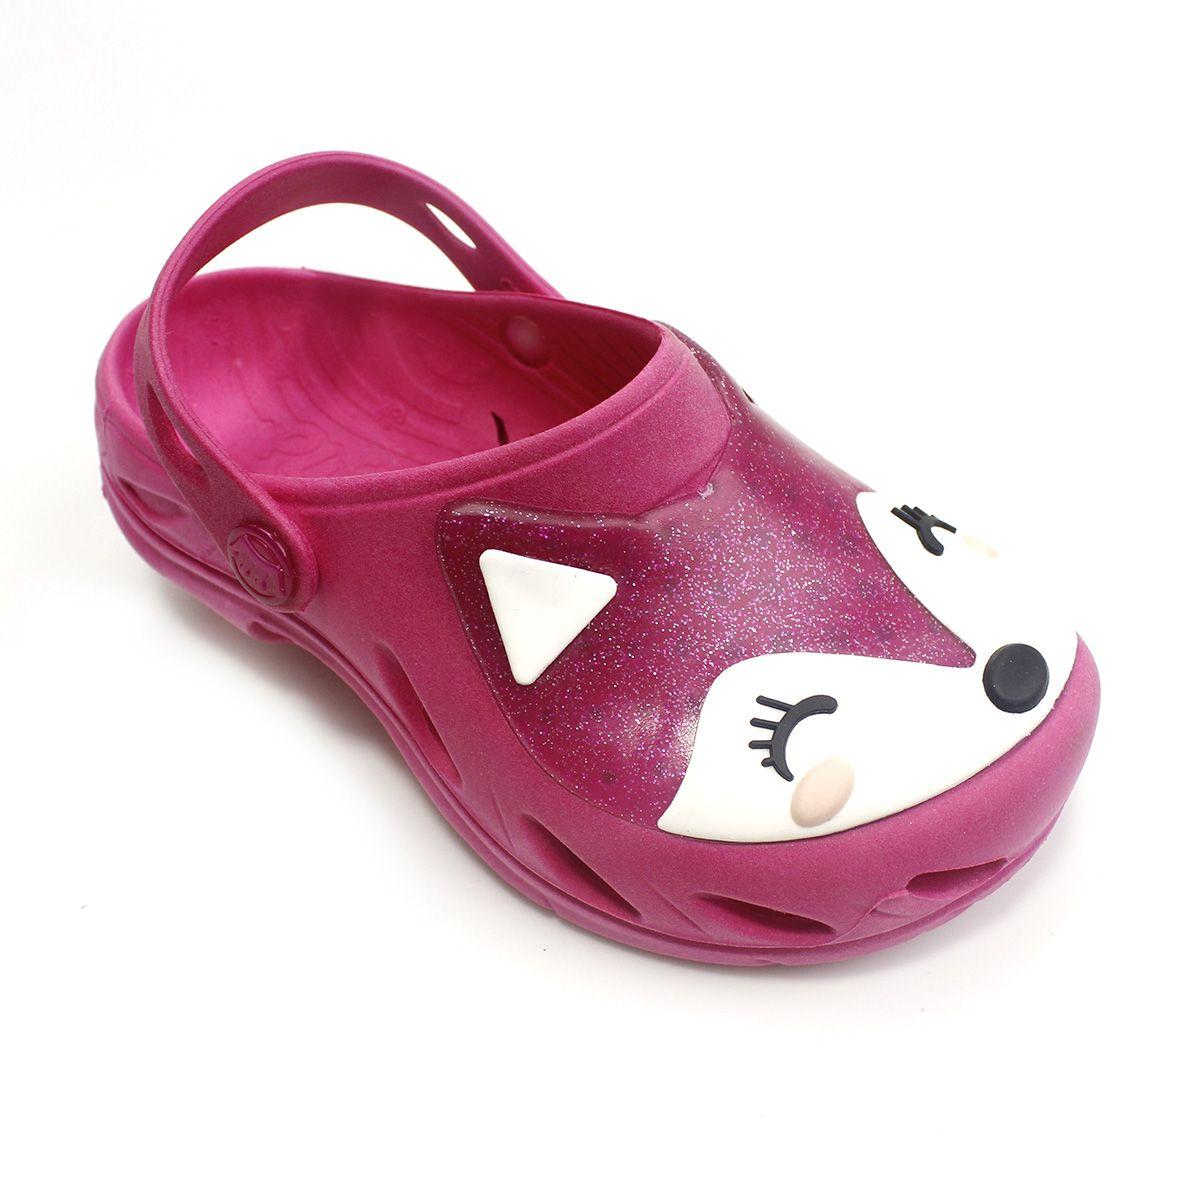 Babuche Plugt Ventor Raposa Pink